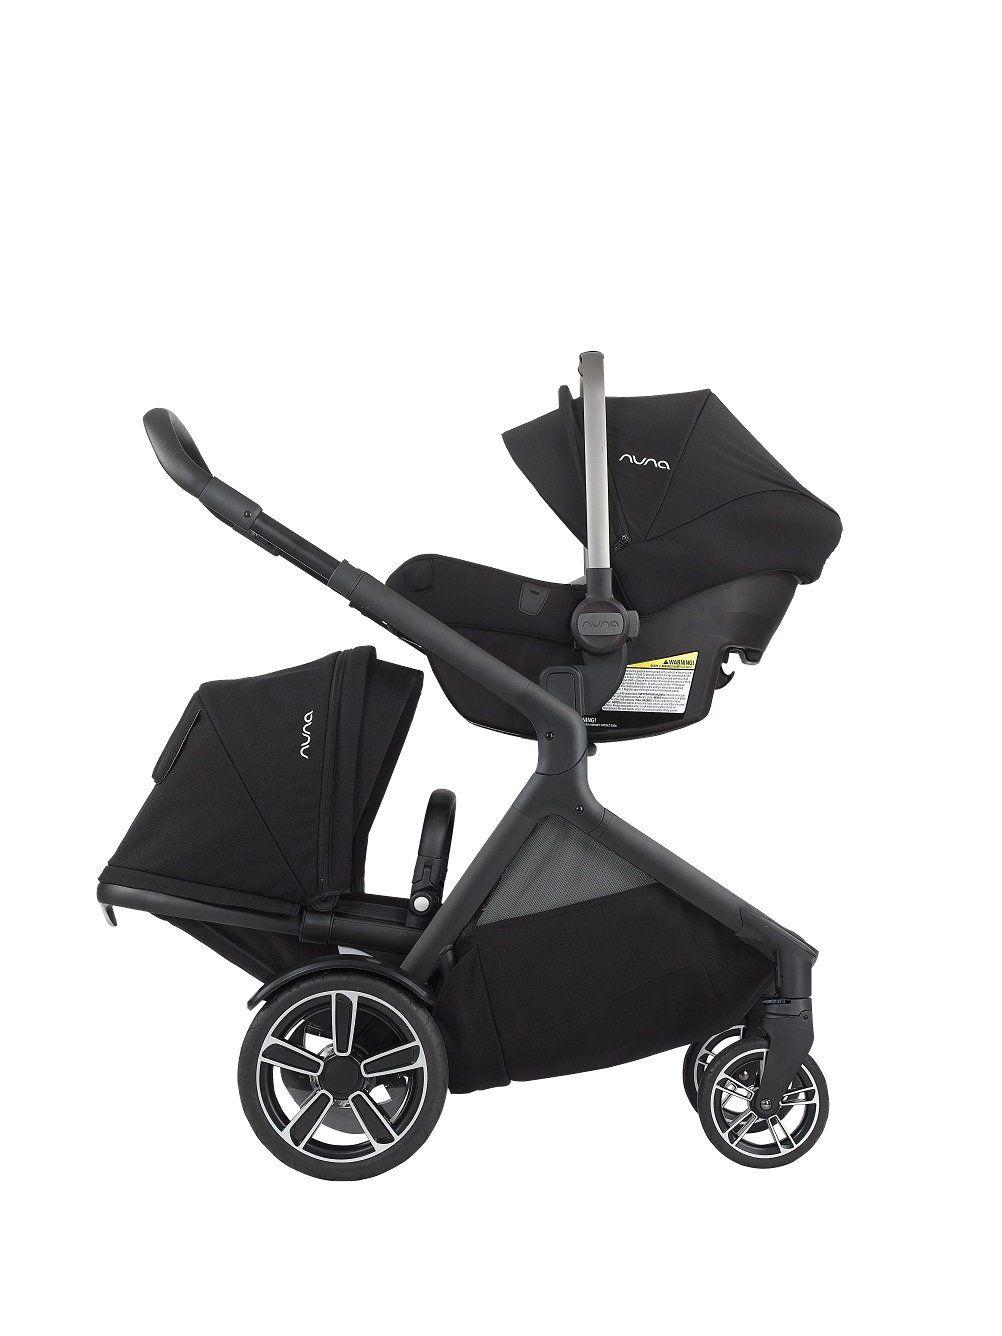 Nuna demigrow stroller baby strollers best baby